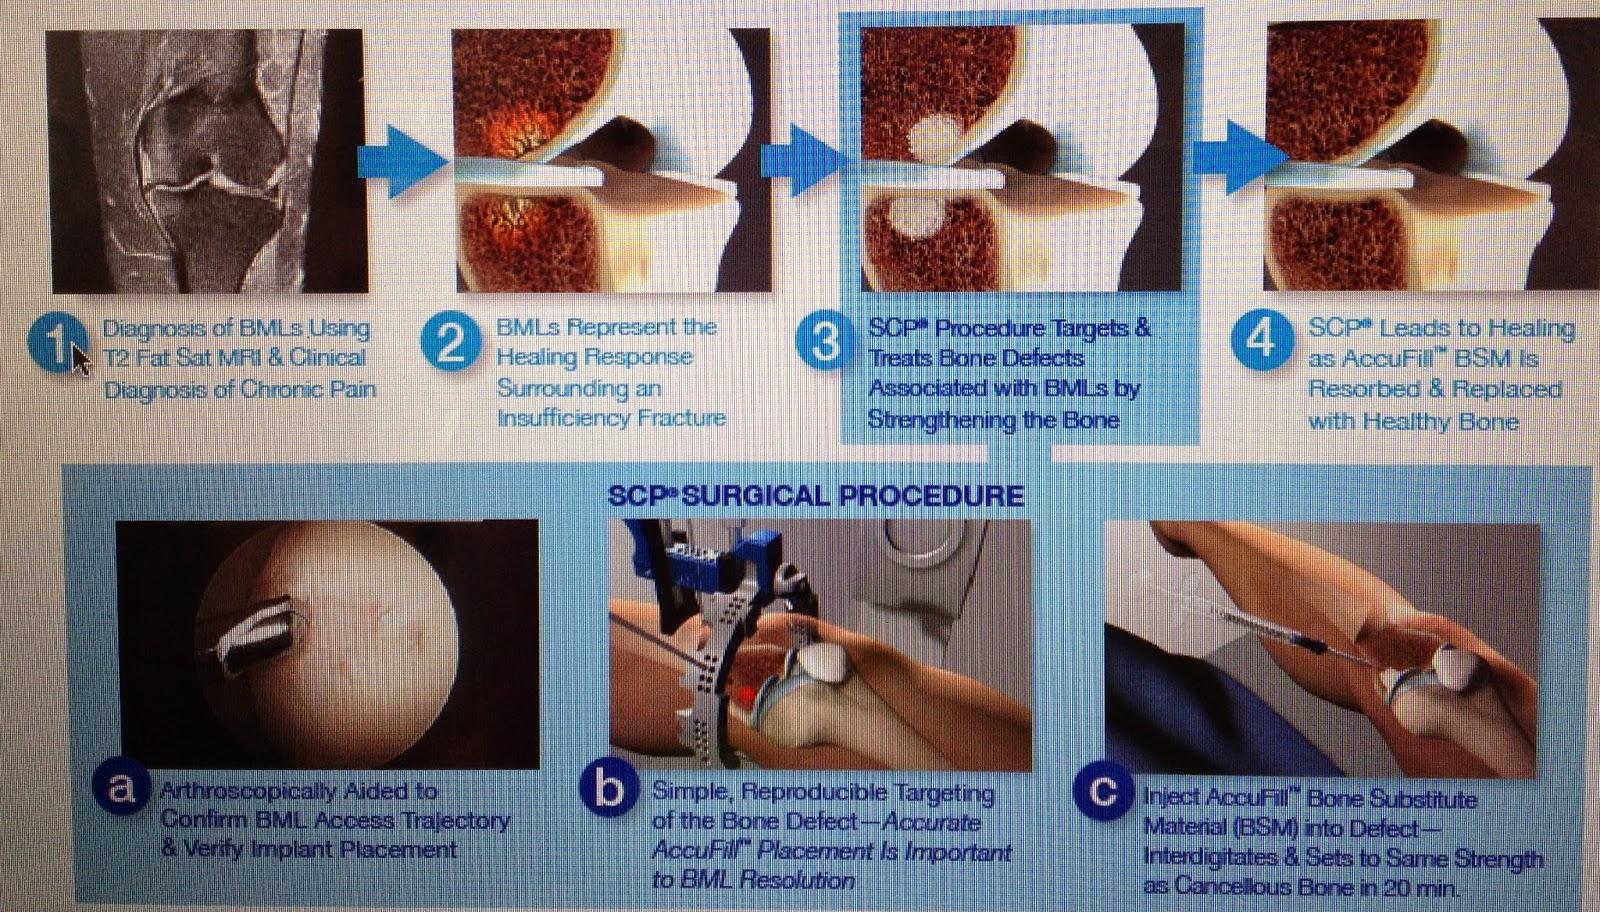 SCP Surgical Procedure Photo